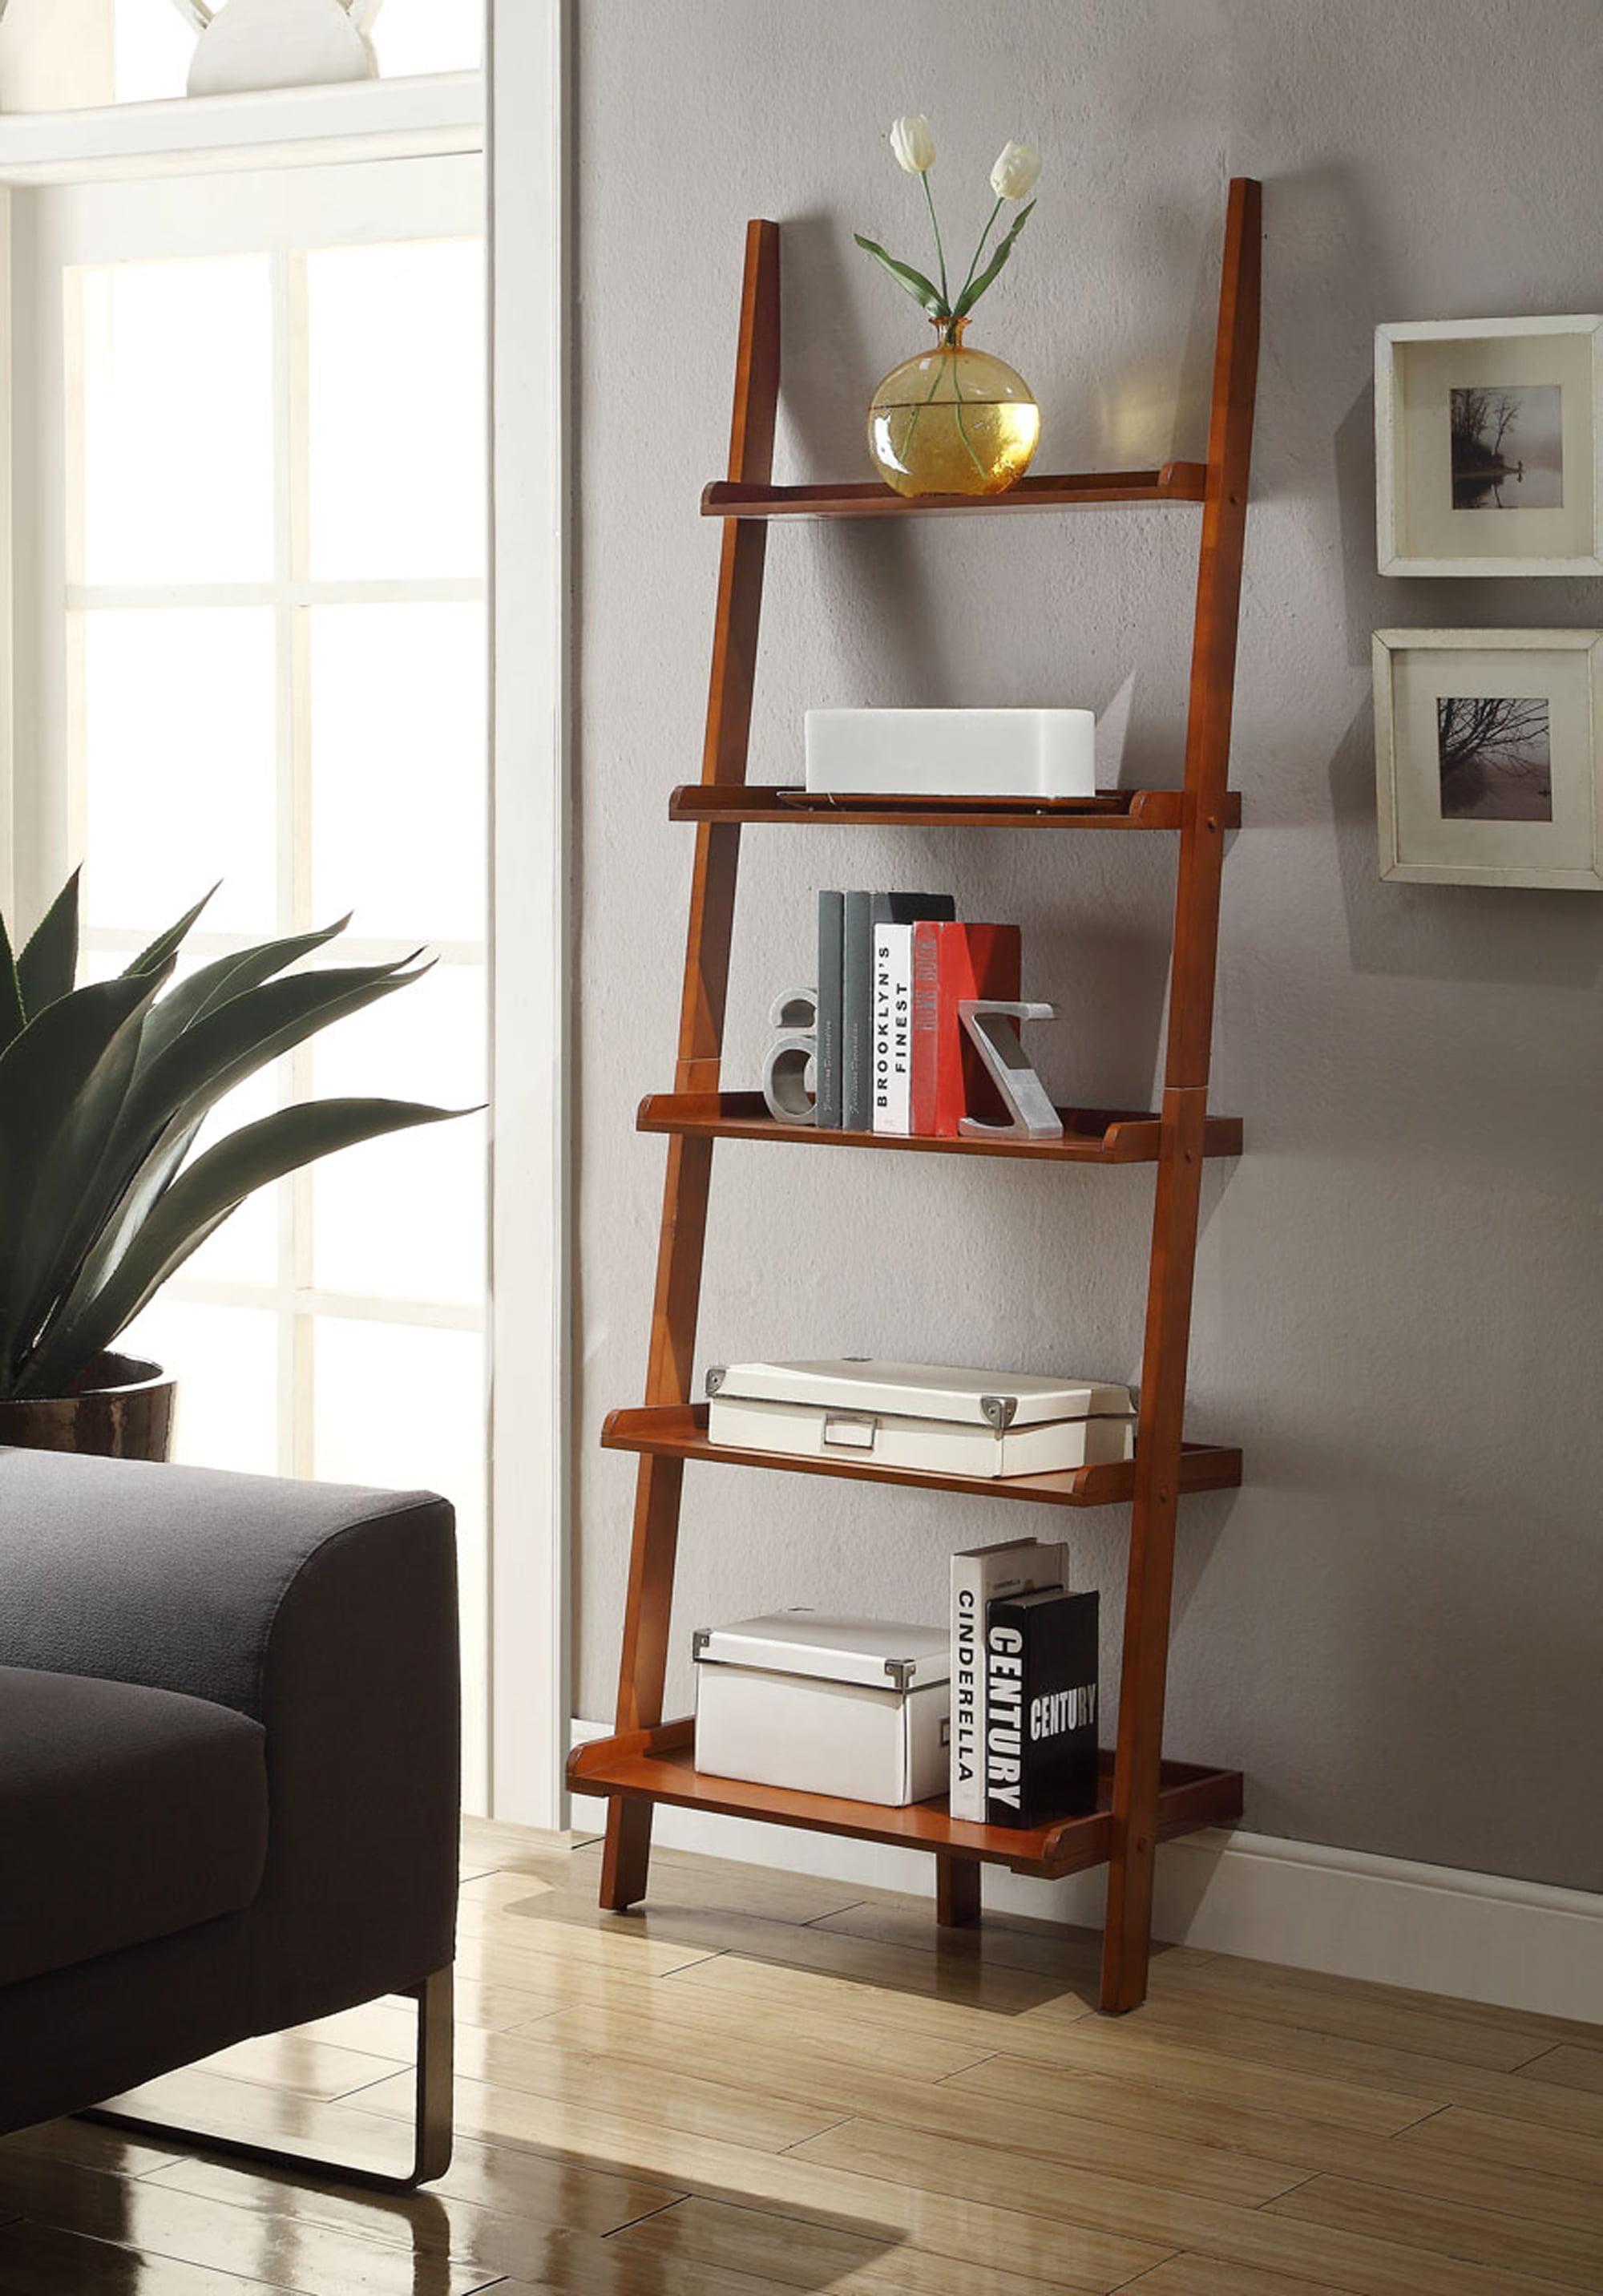 Cherry Finish Leaning Ladder Bookcase 5 Tier Open Design Display Home Bookshelf Ebay